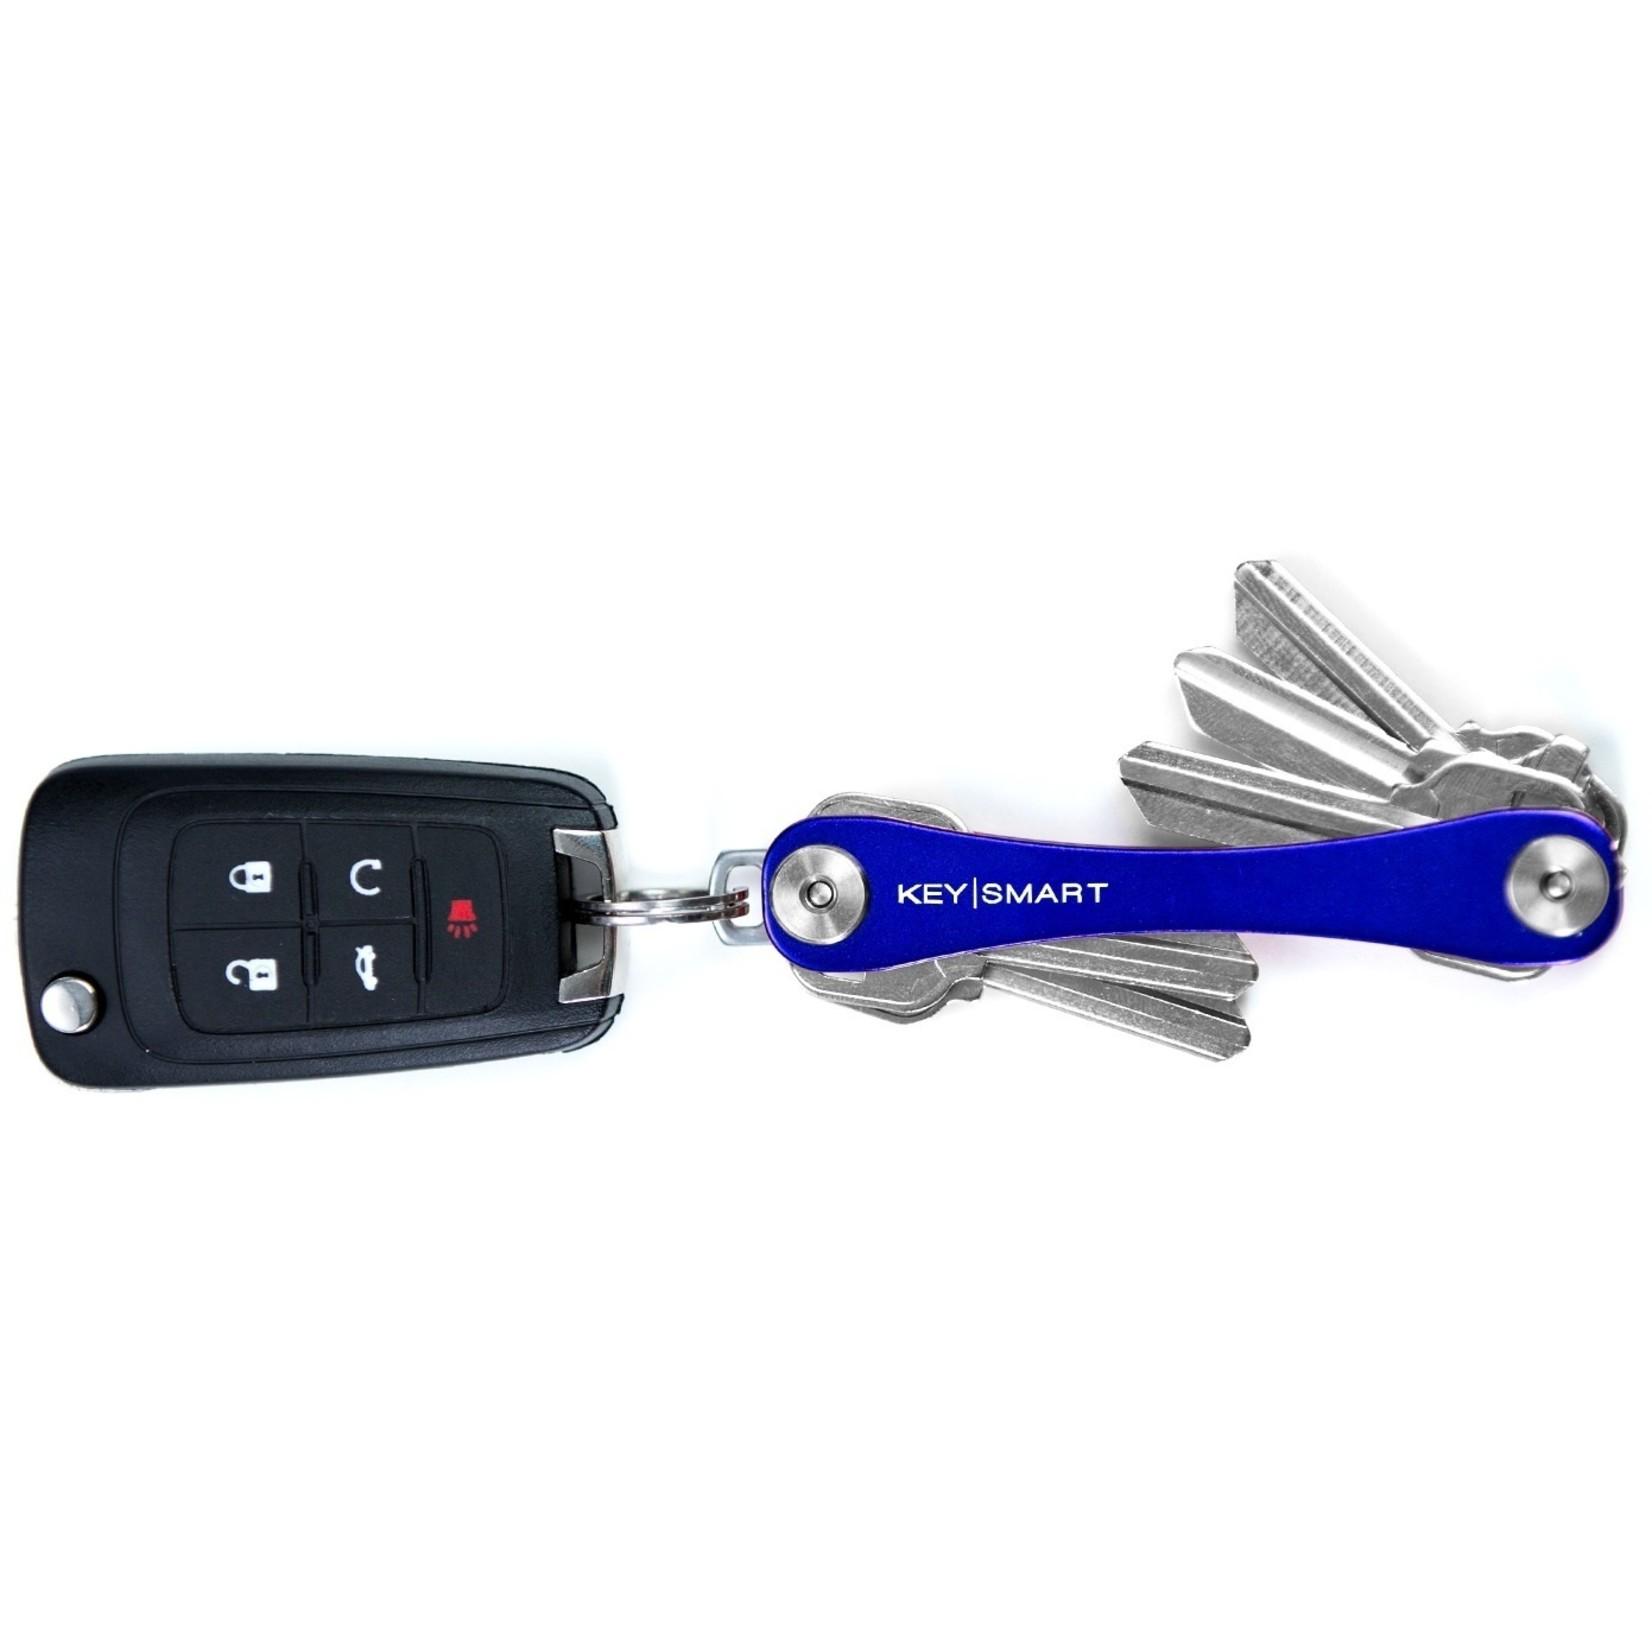 KeySmart KeySmart Compact sleutelhouder blauw